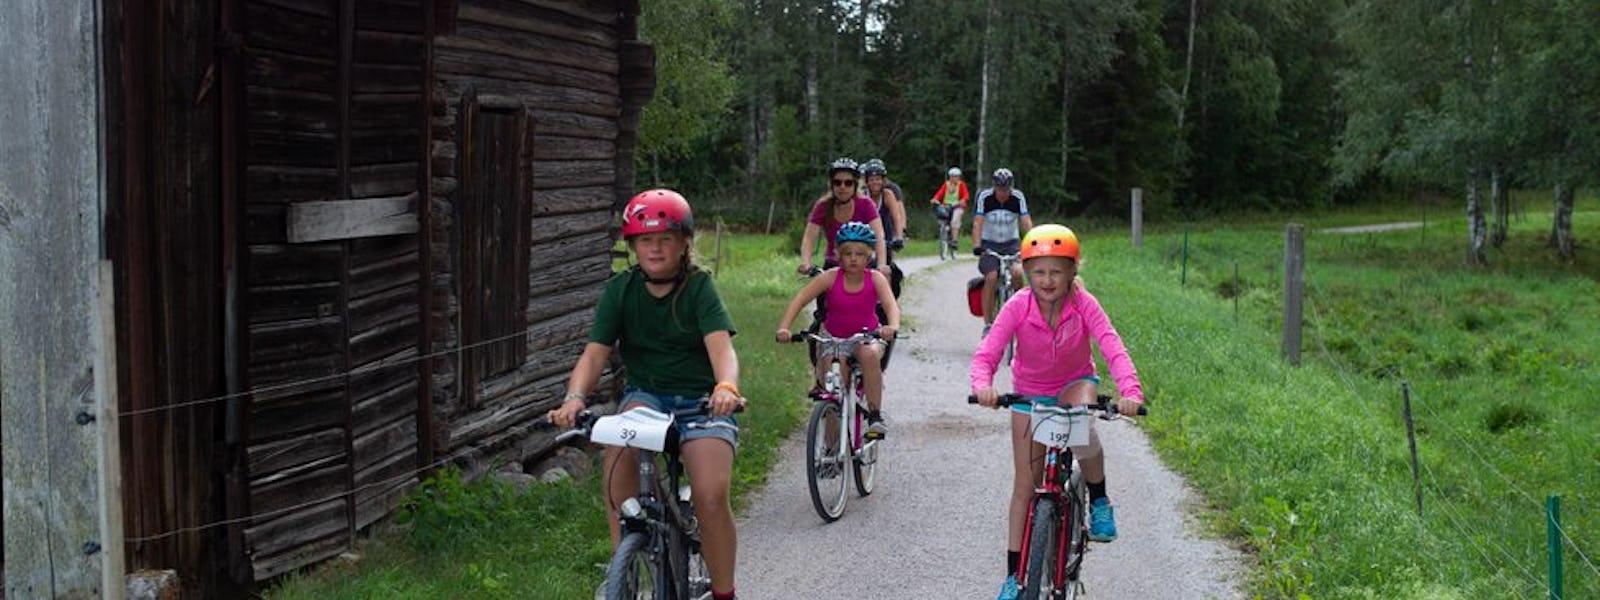 Bild - Cykelturveckans premiärtur till Wanås